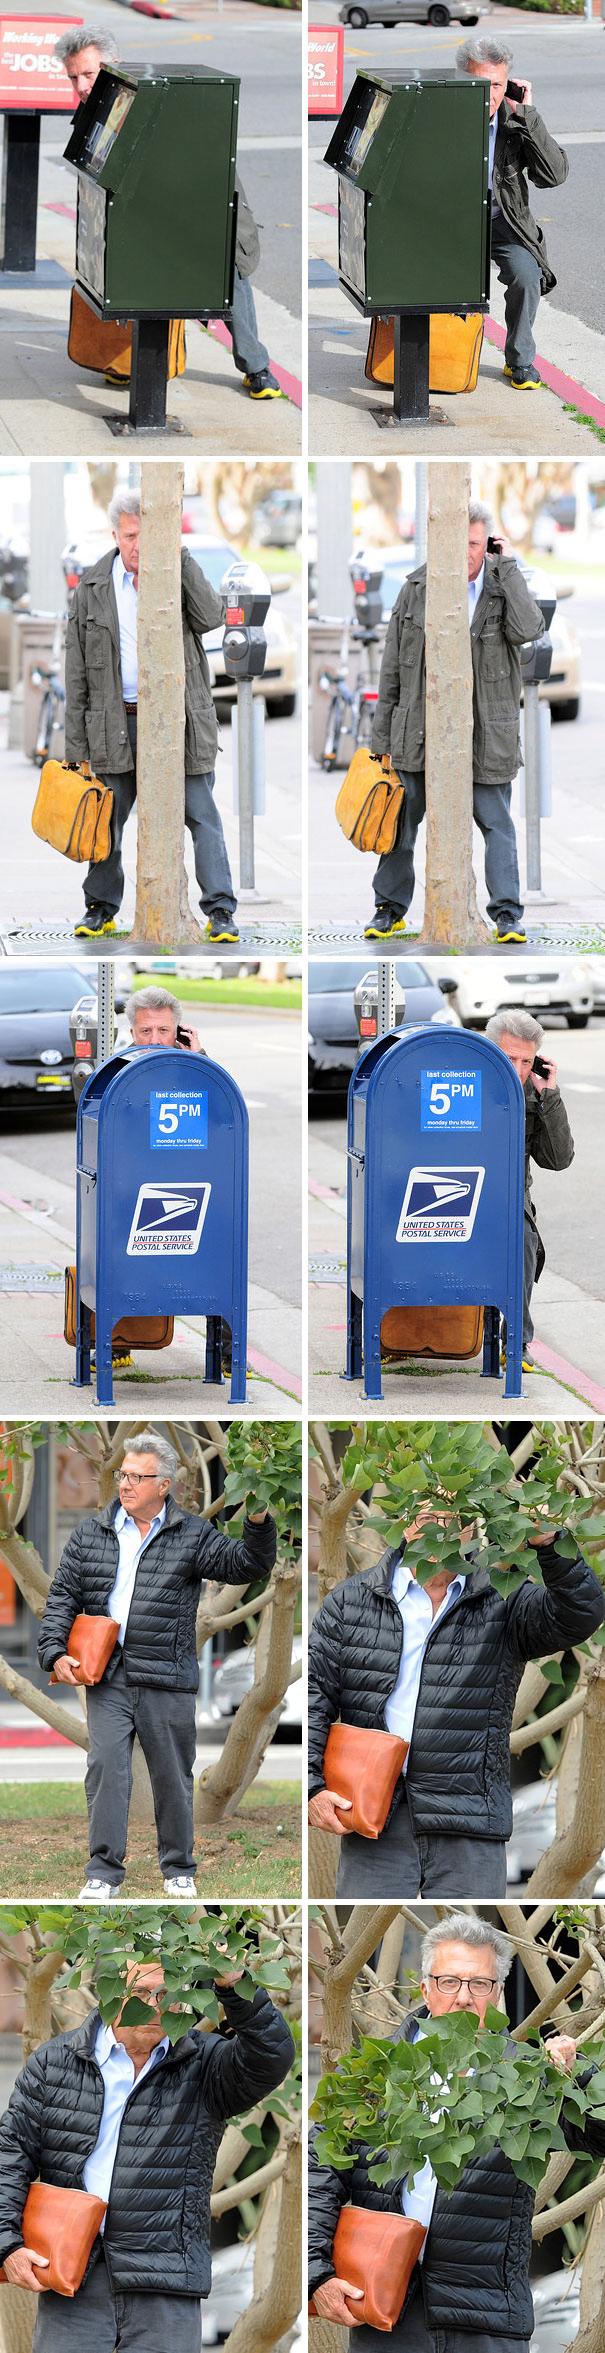 funny-celebrity-reactions-to-paparazzi-photos-8